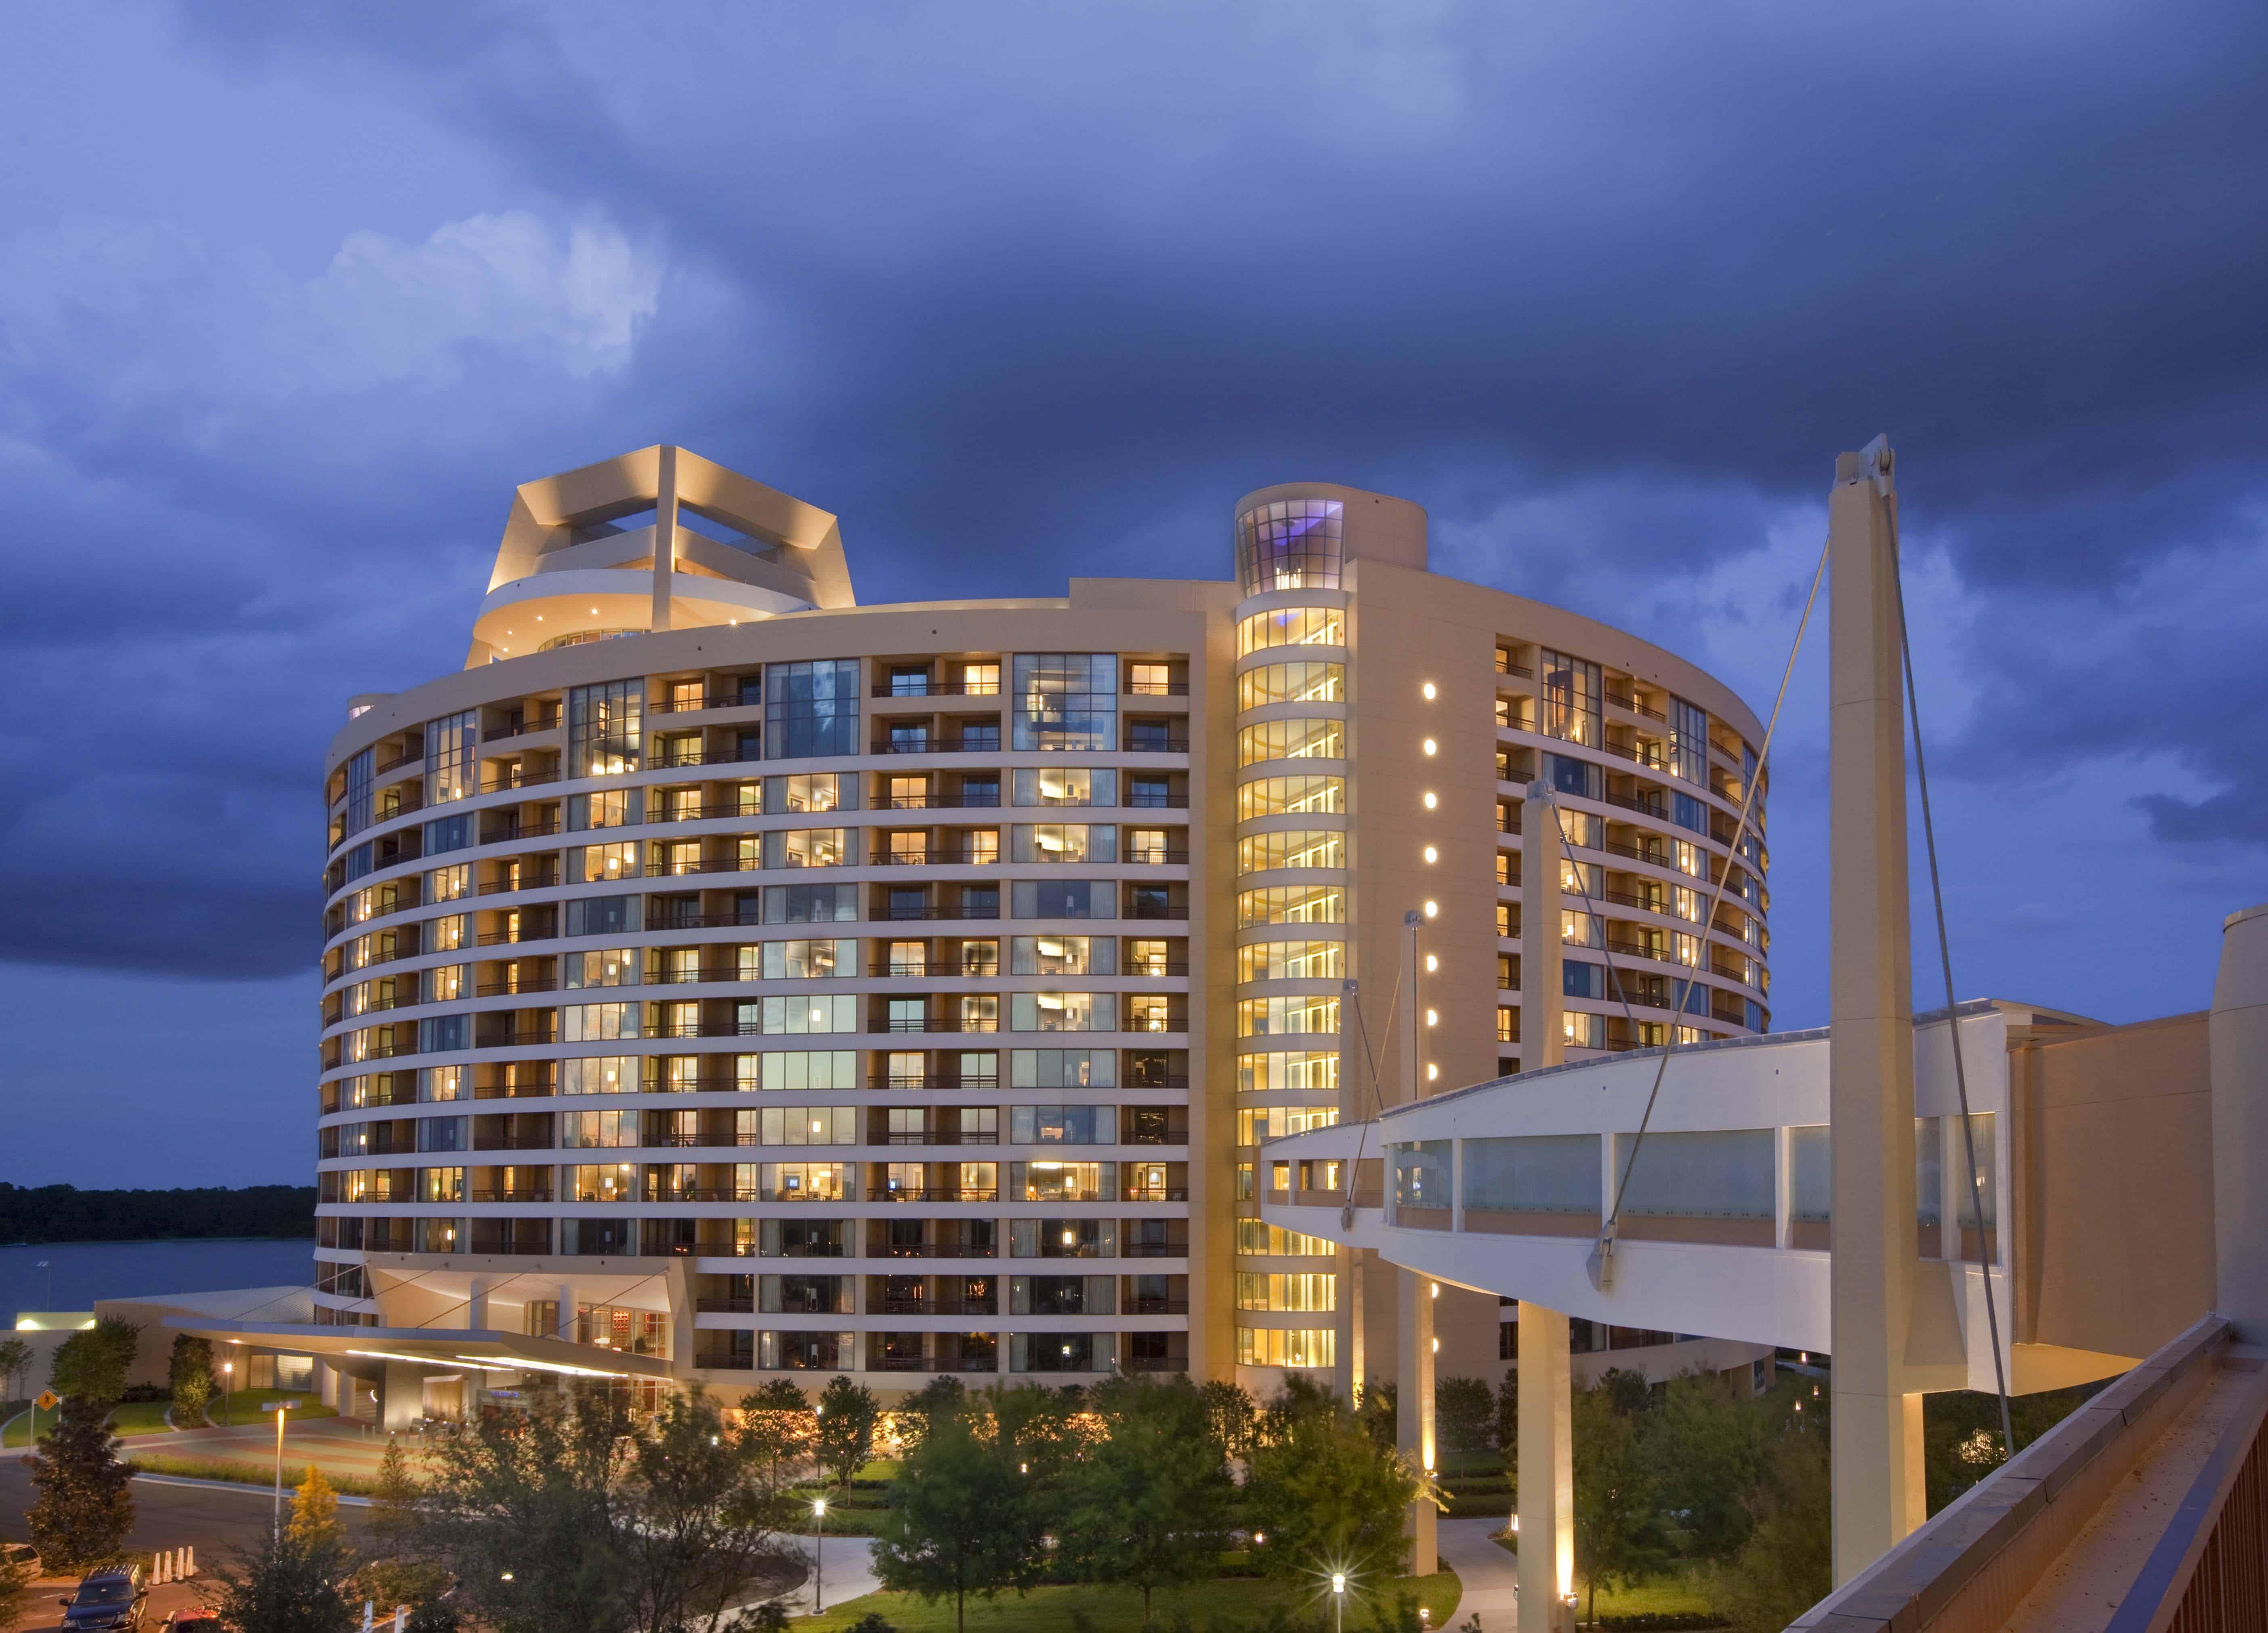 Wdw Resort Hotels